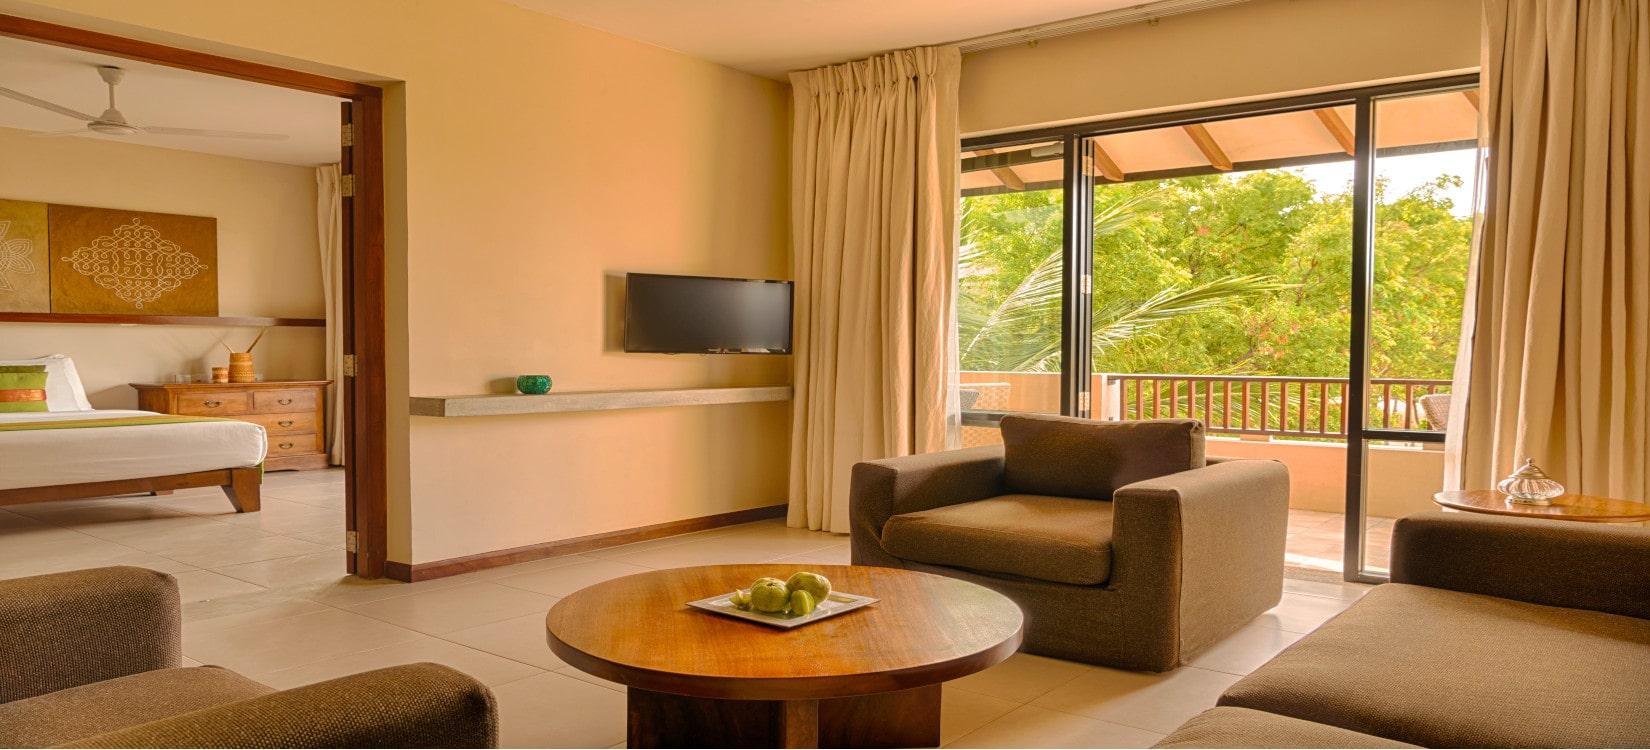 suite room Sunrise Resort-min